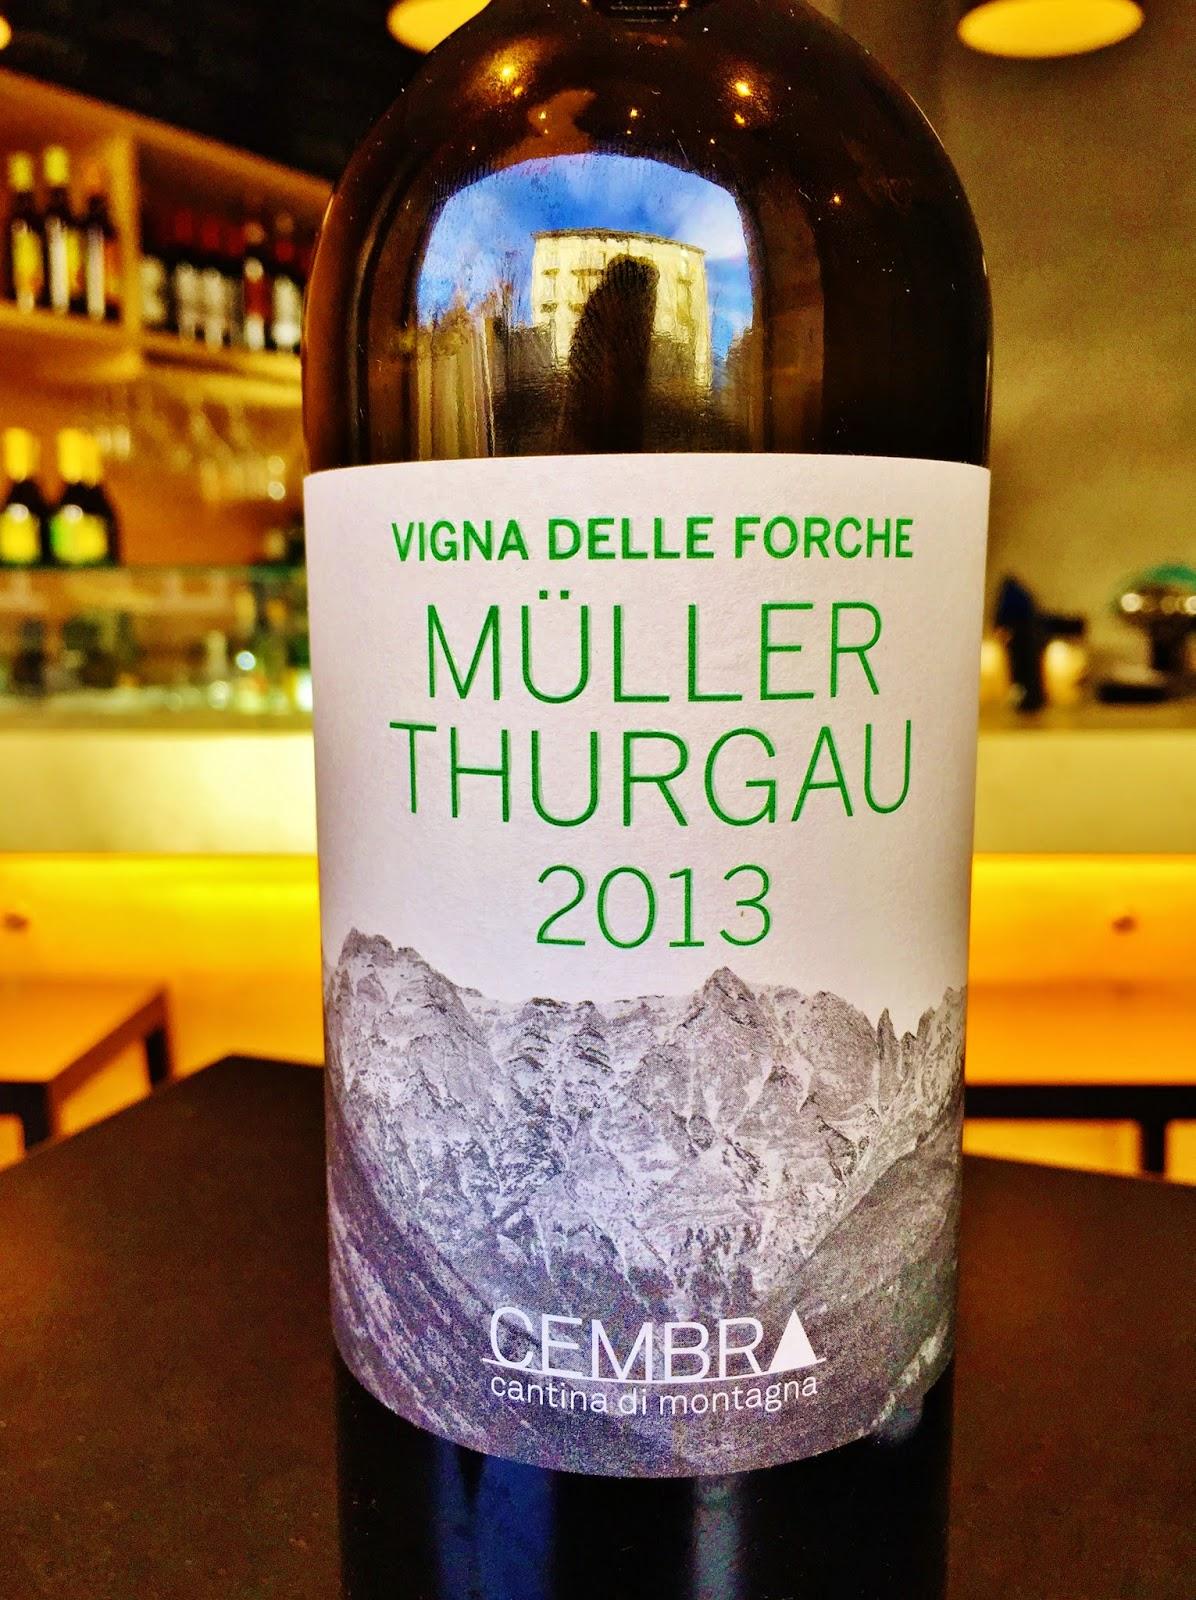 2013 Cembra Cantina di Montagna Muller Thurgau